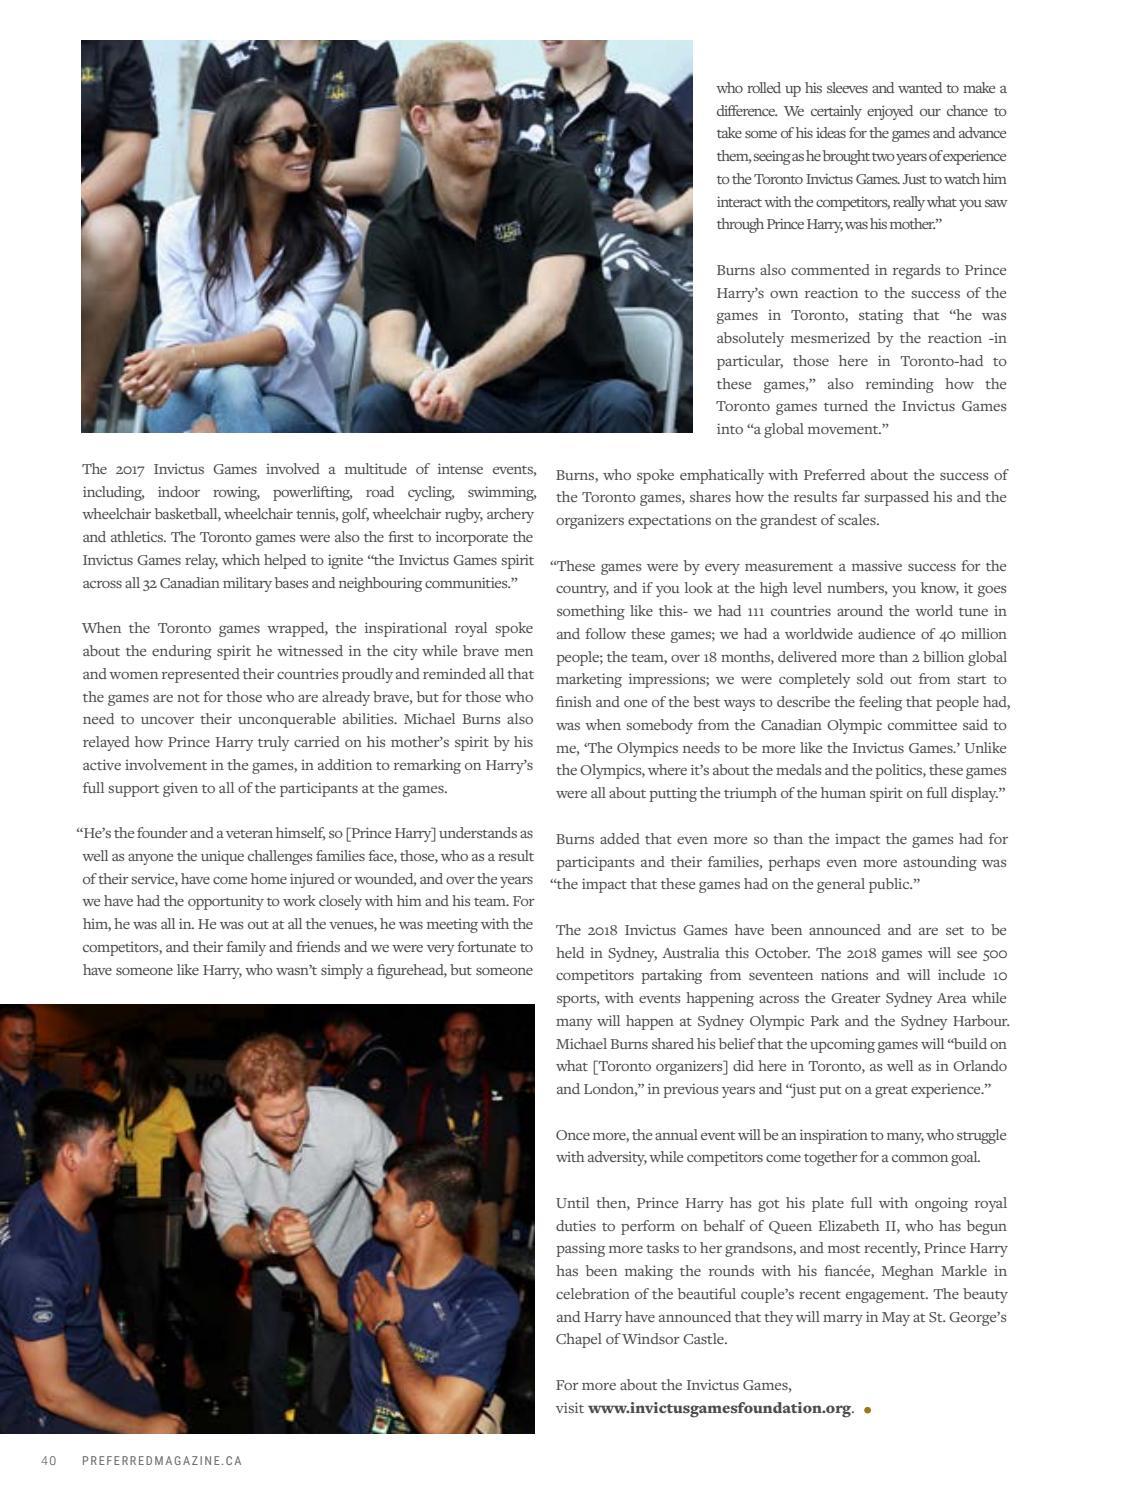 Preferred Magazine - February 2018 by PreferredMagazine - issuu